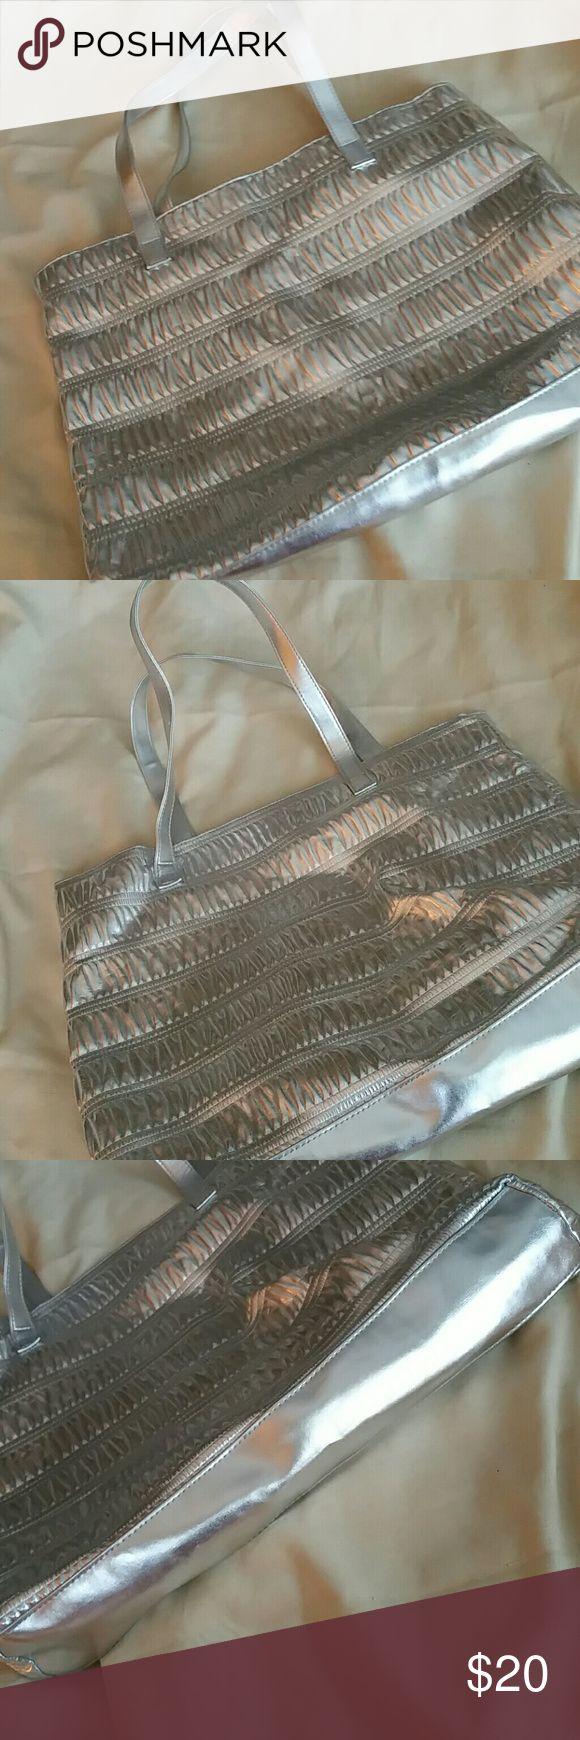 Clinque Silver Tote Bag NWOT Clinque gathered large silver tote bag. Clinique Bags Totes